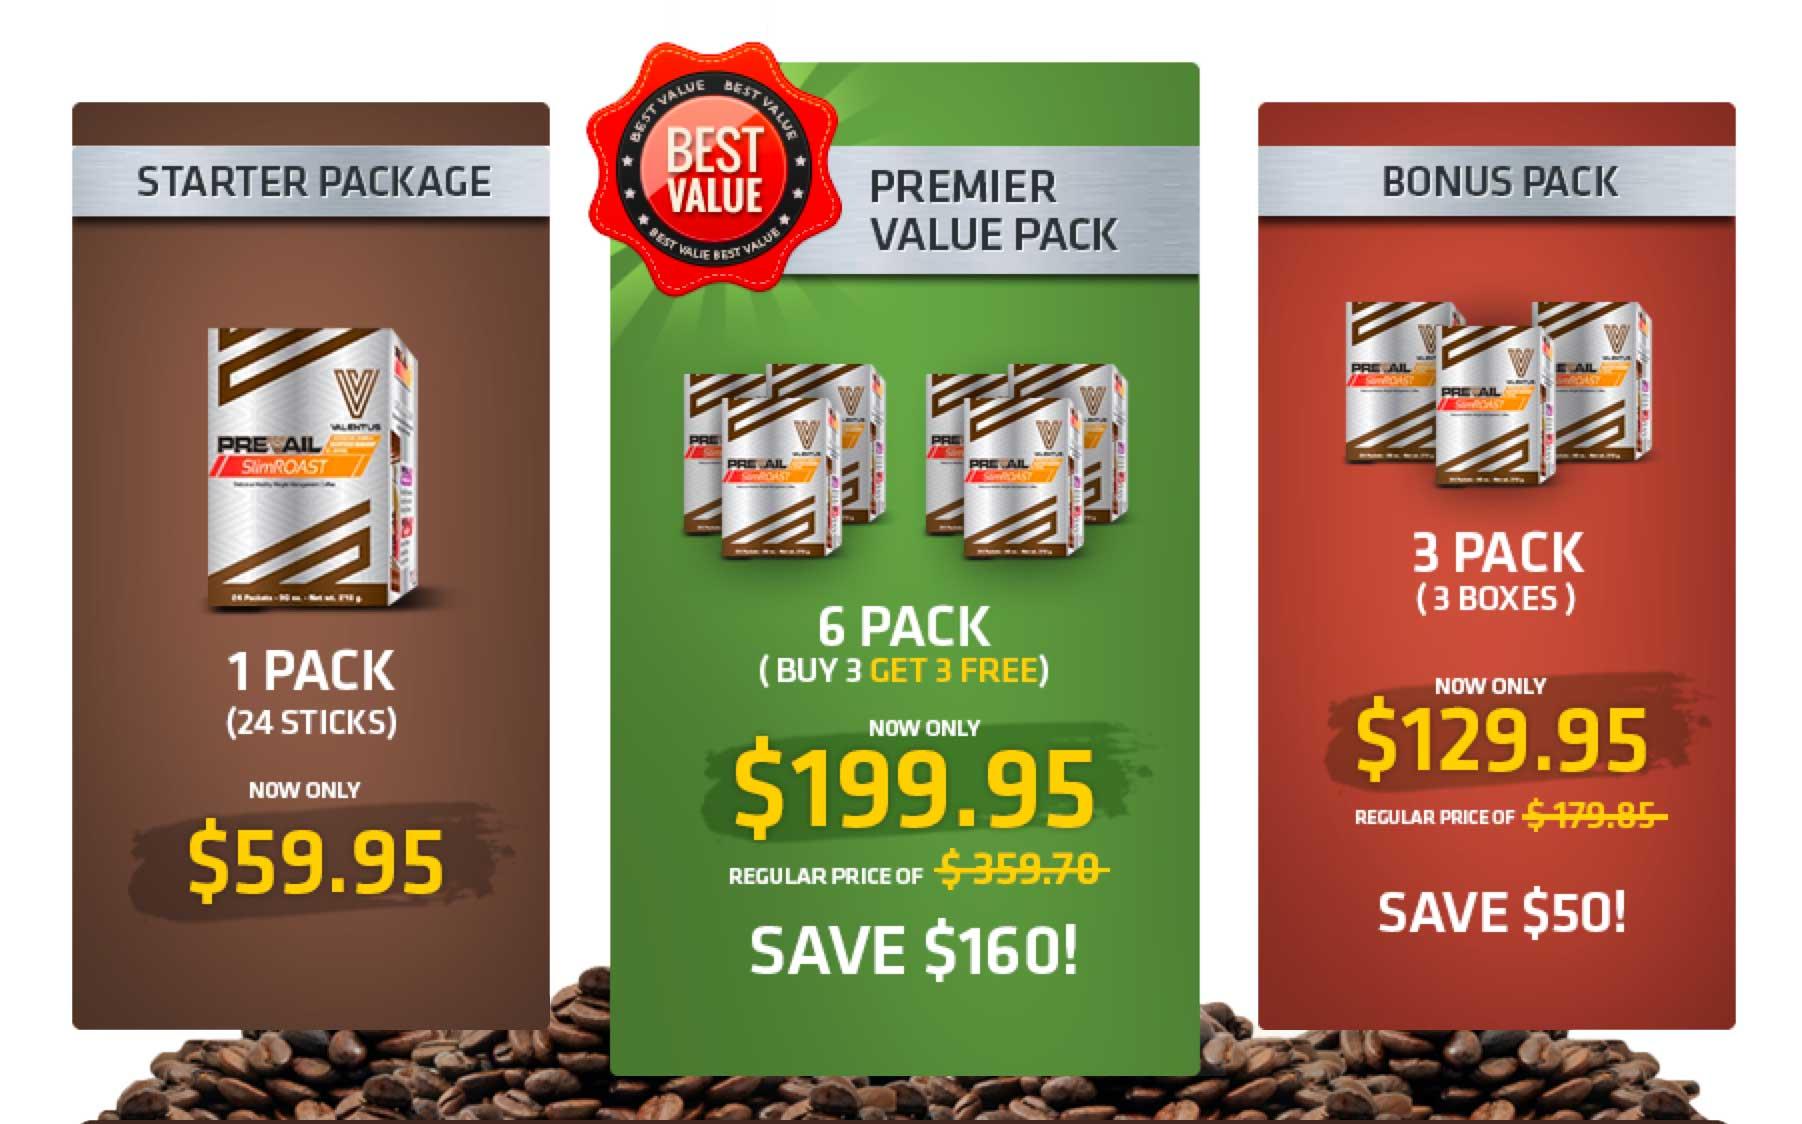 Valentus Prevail SlimROAST coffee pricing